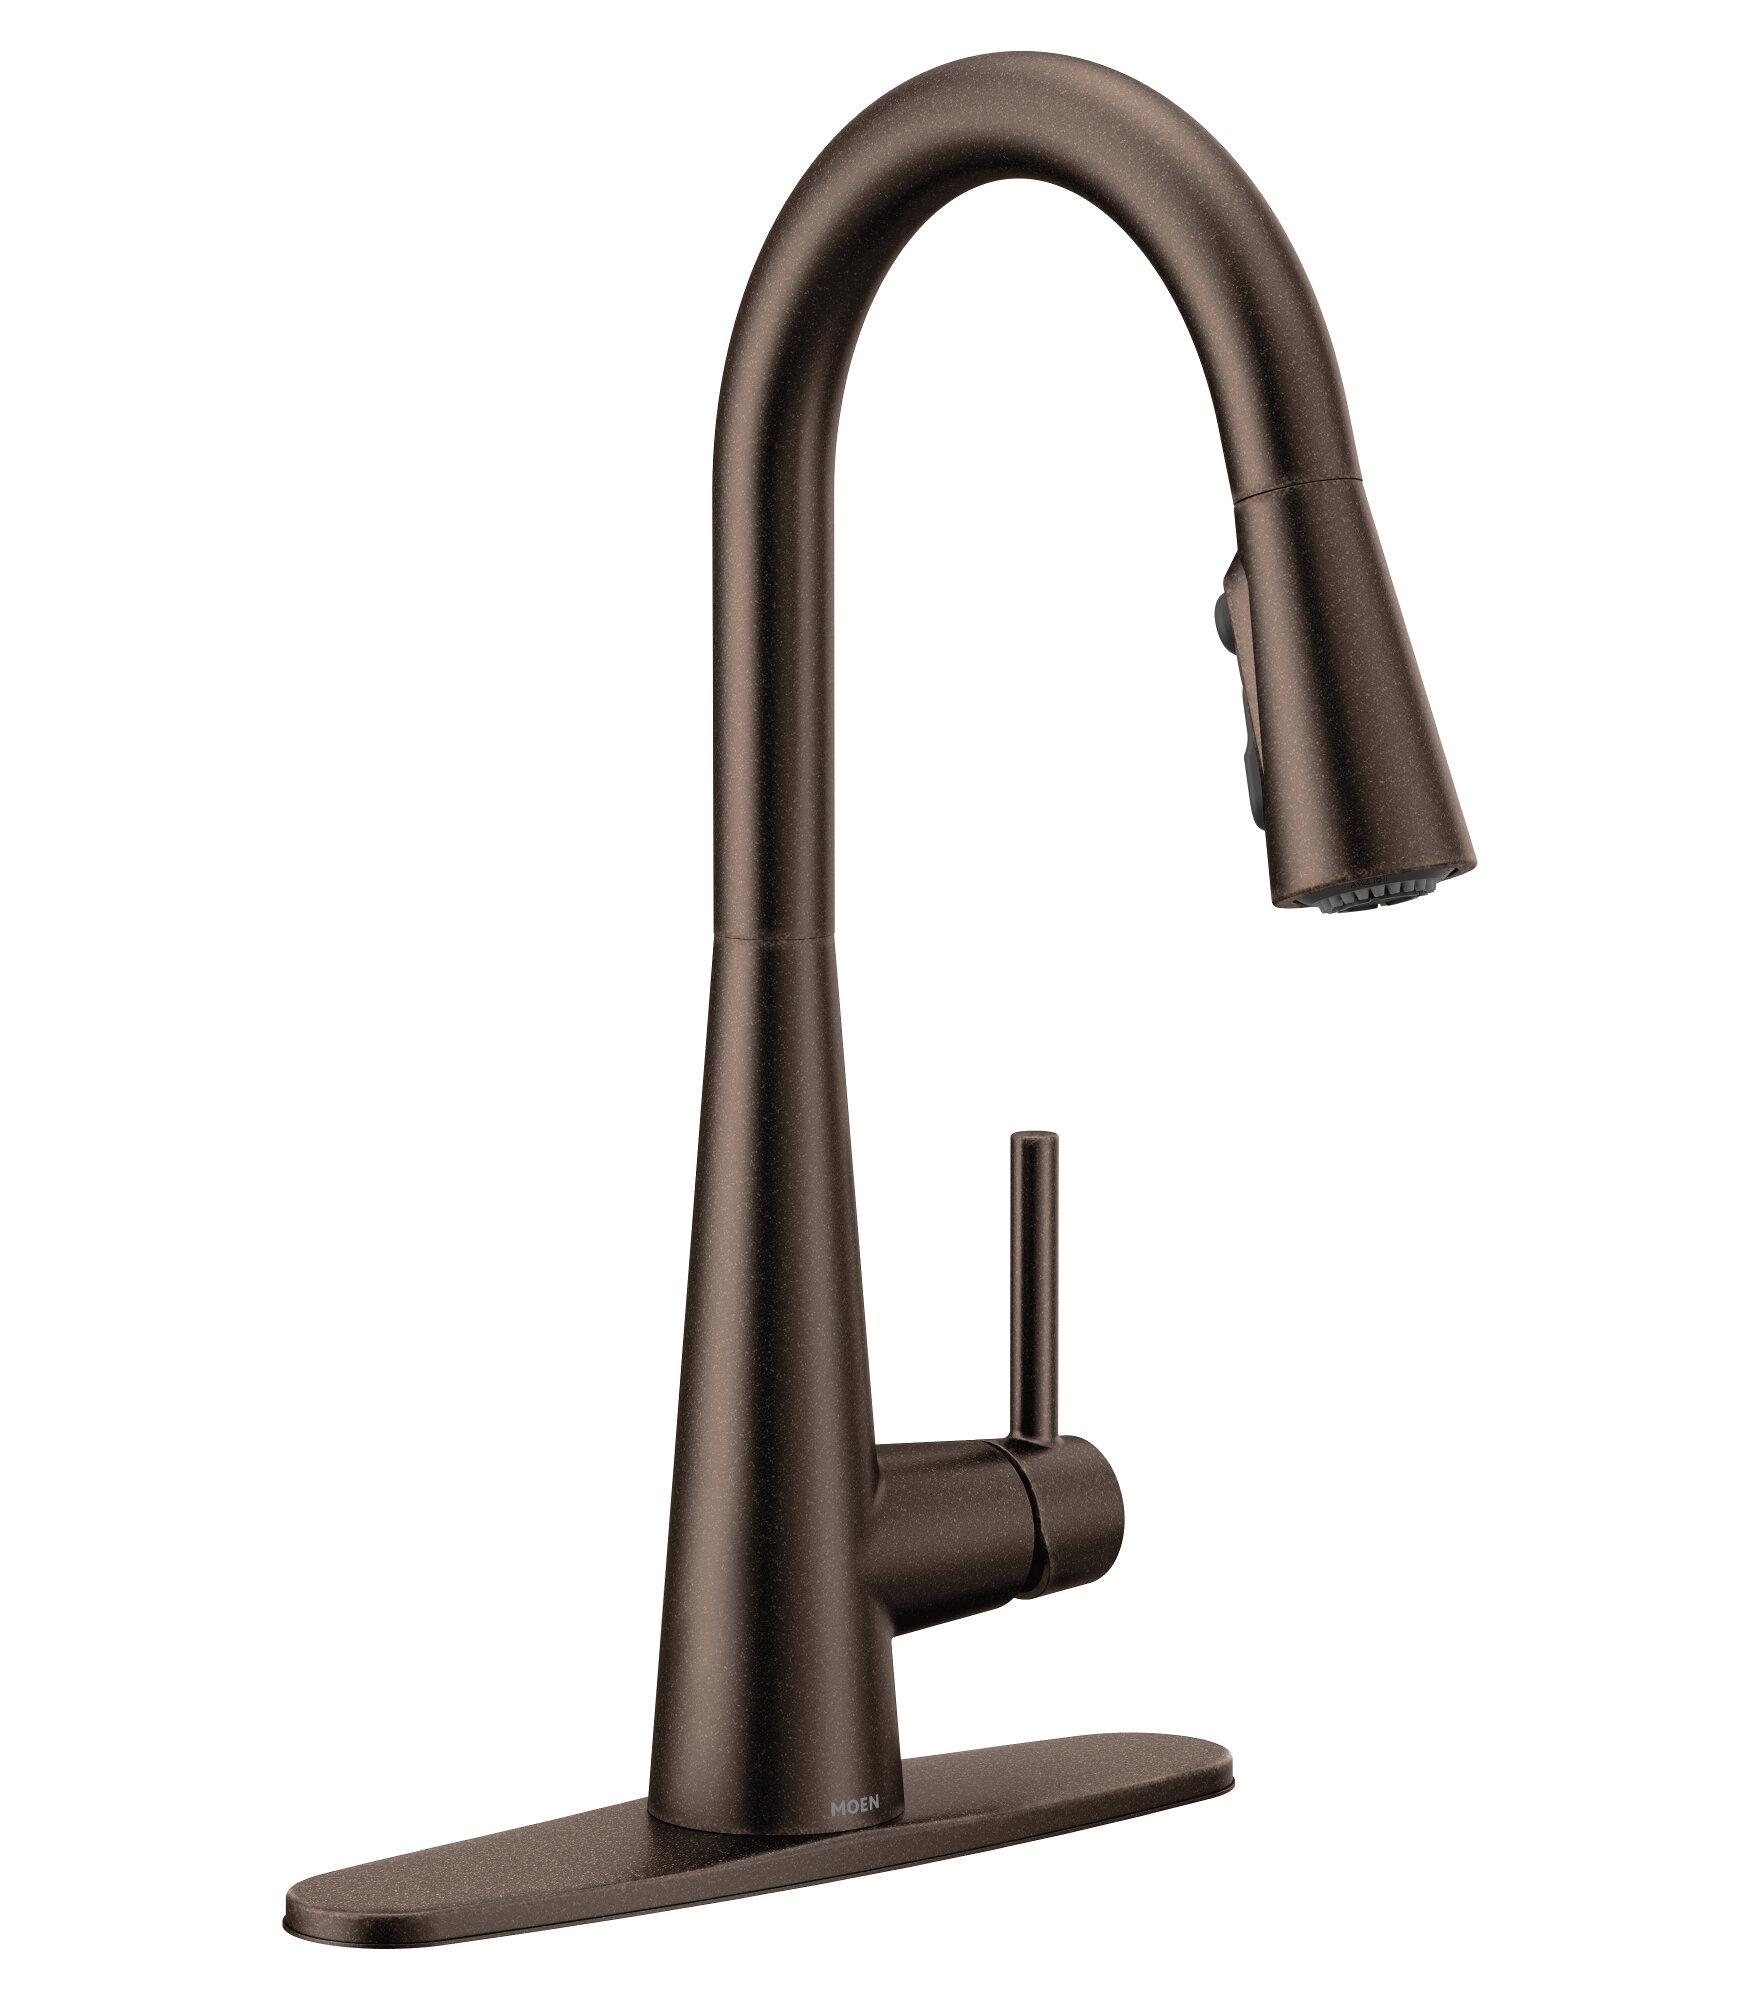 Moen Sleek High Single Handle Kitchen Faucet With Power Clean Reviews Wayfair Ca